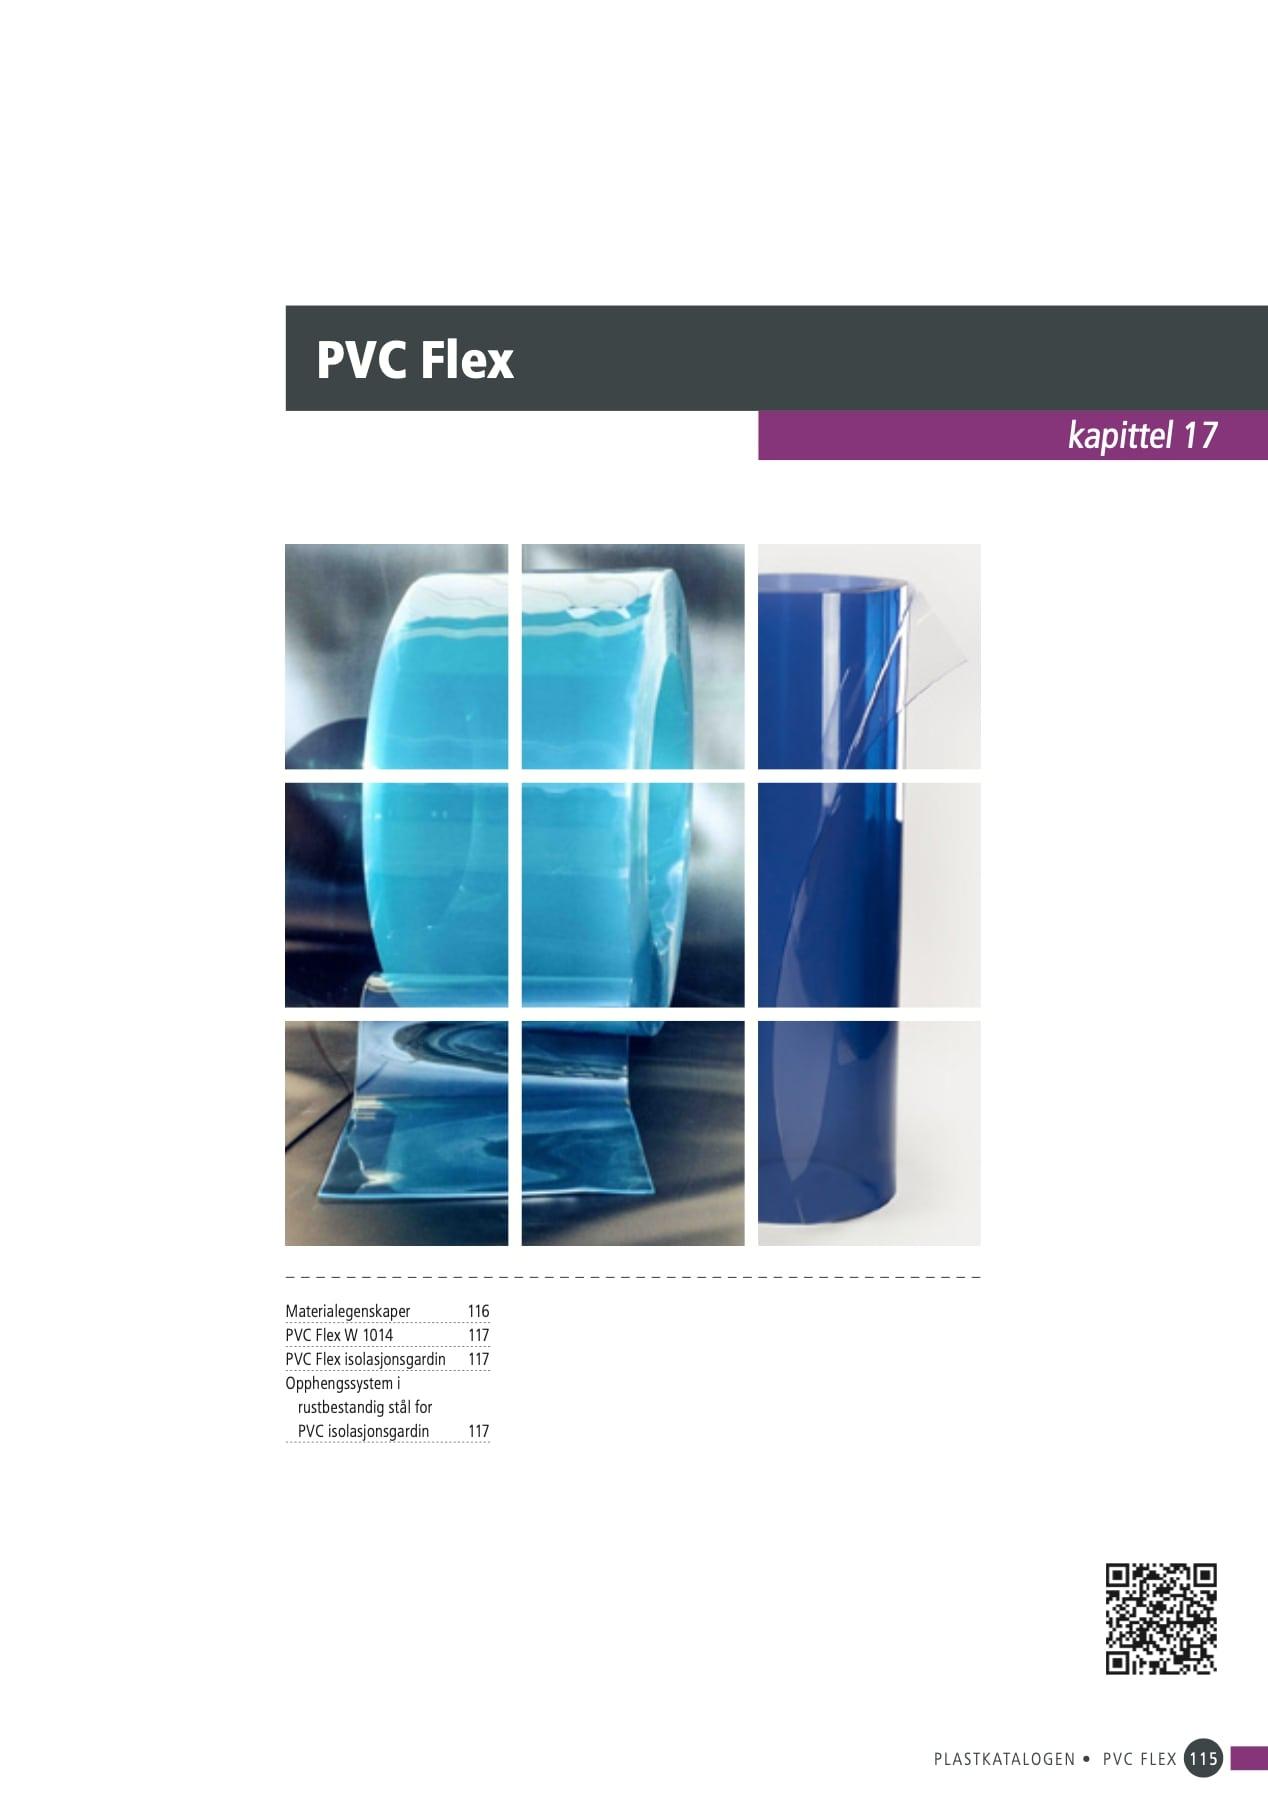 17. PVC FLEX